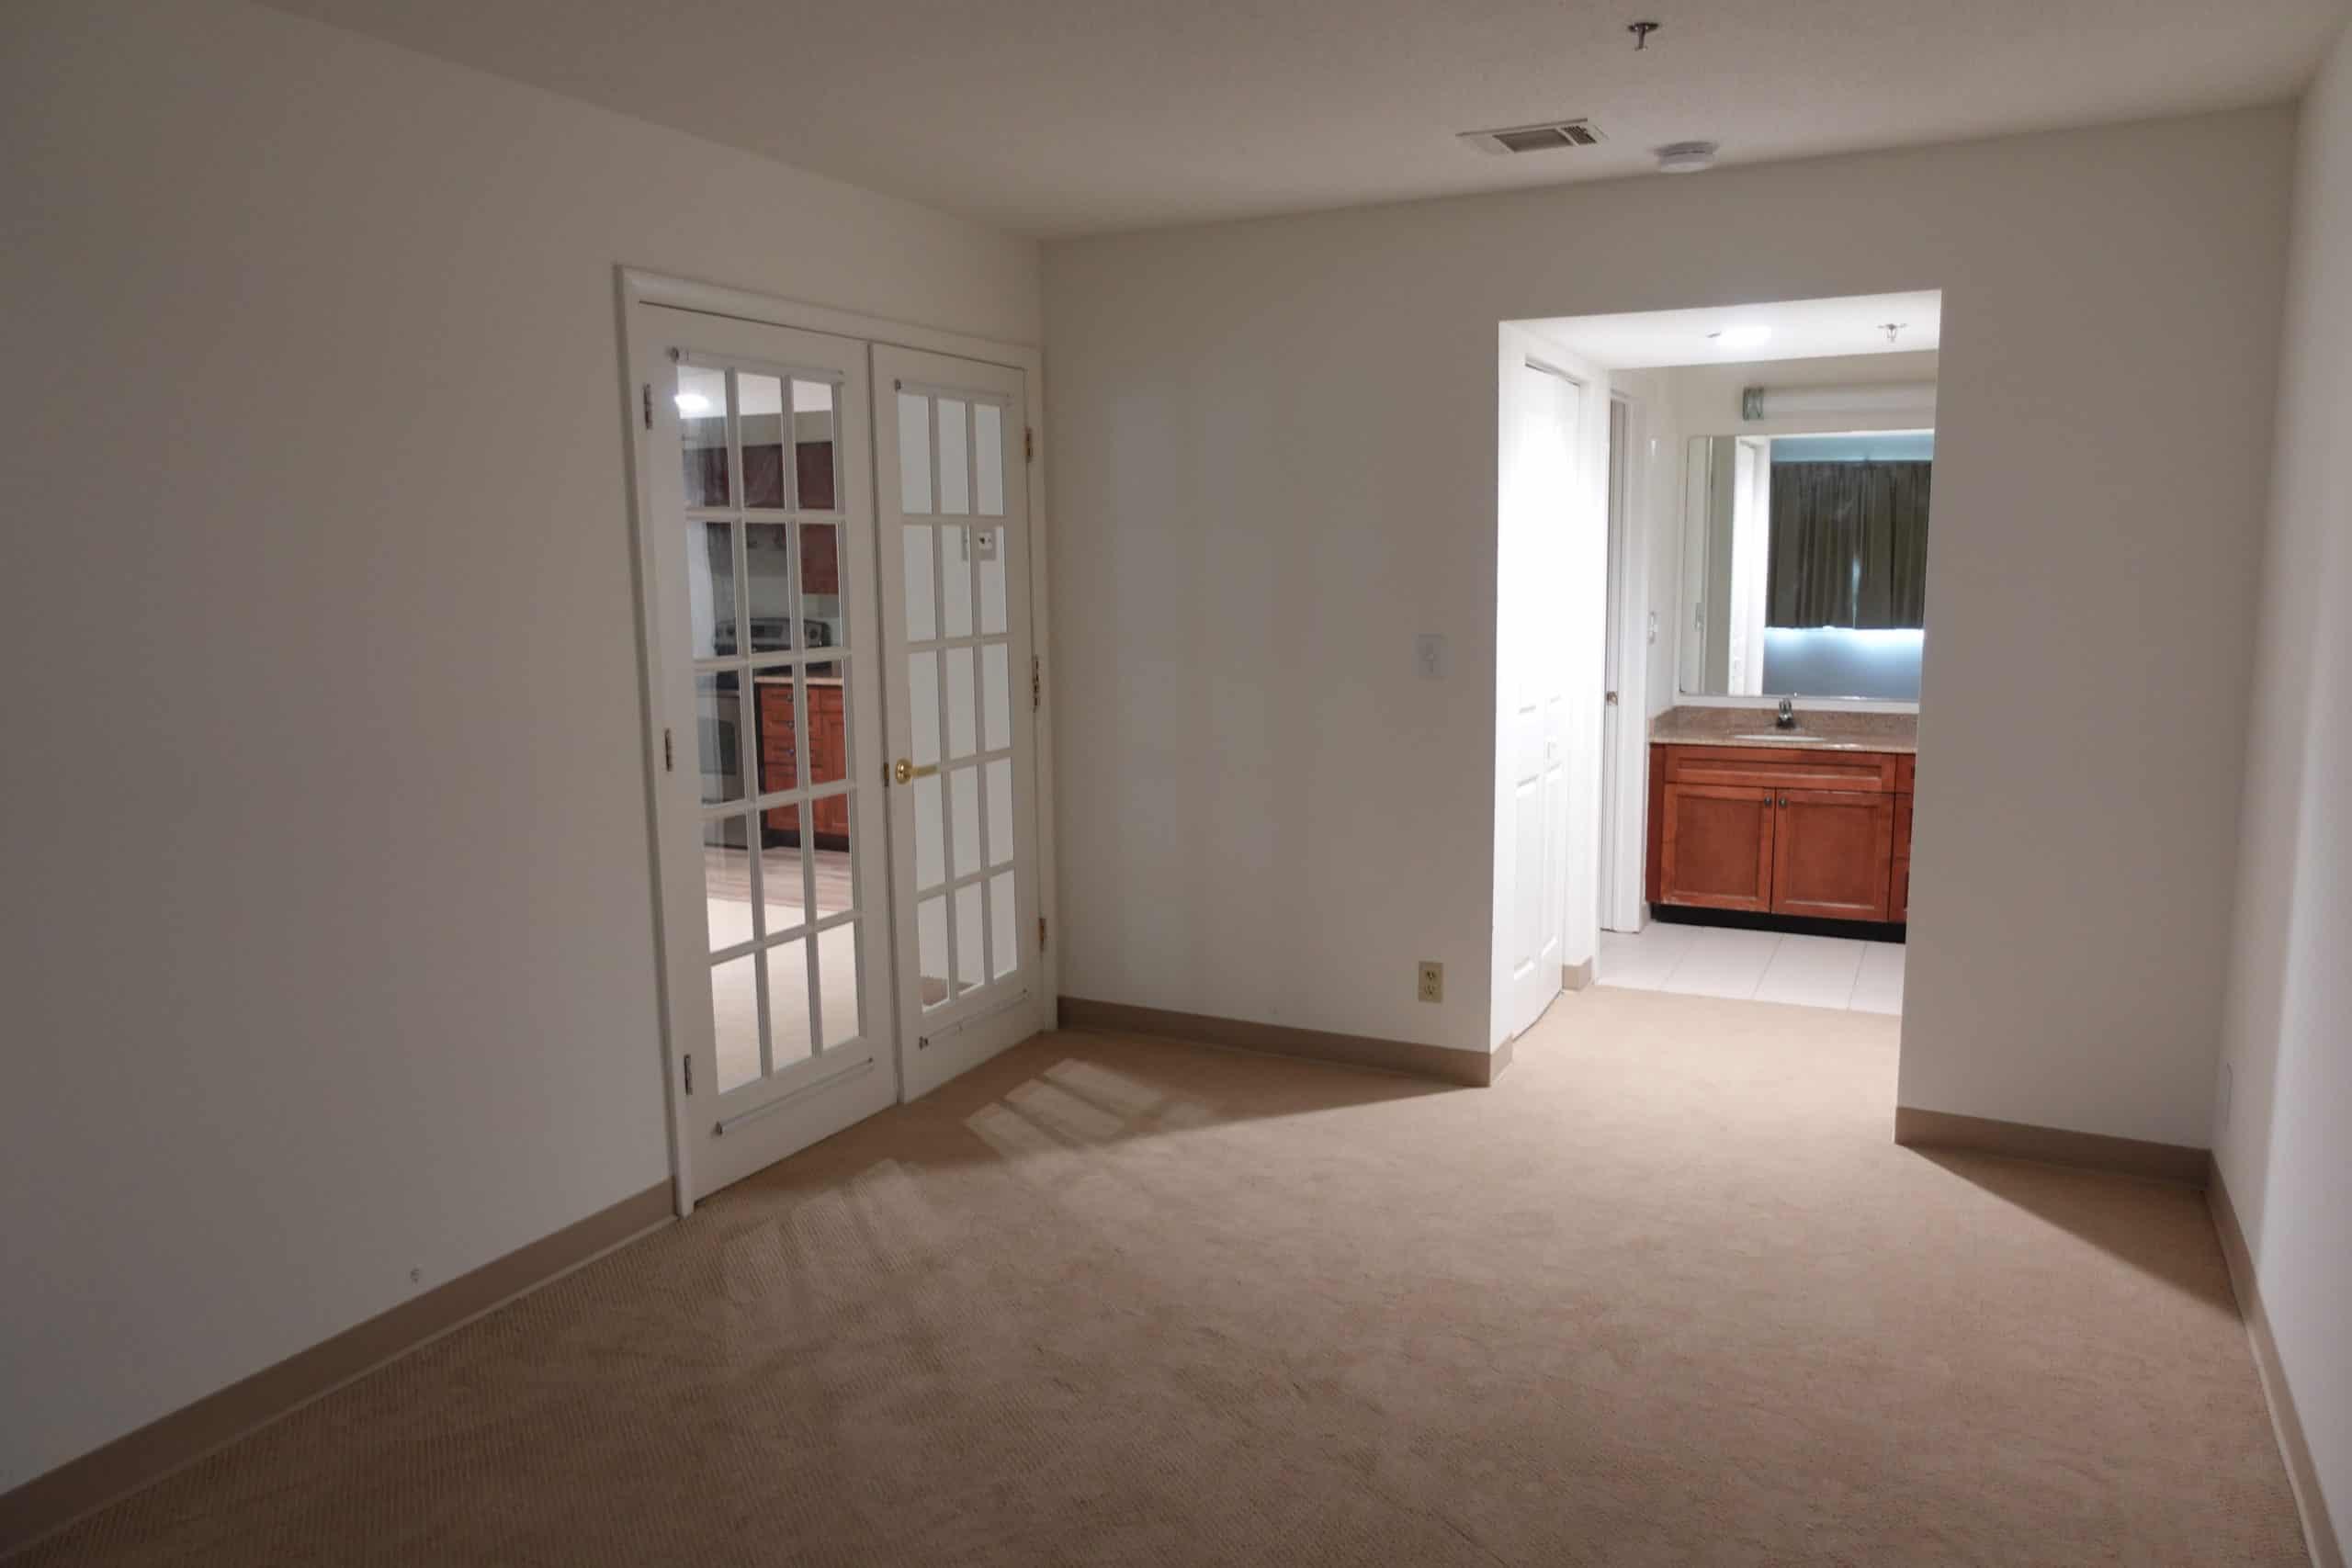 empty bedroom and bathroom